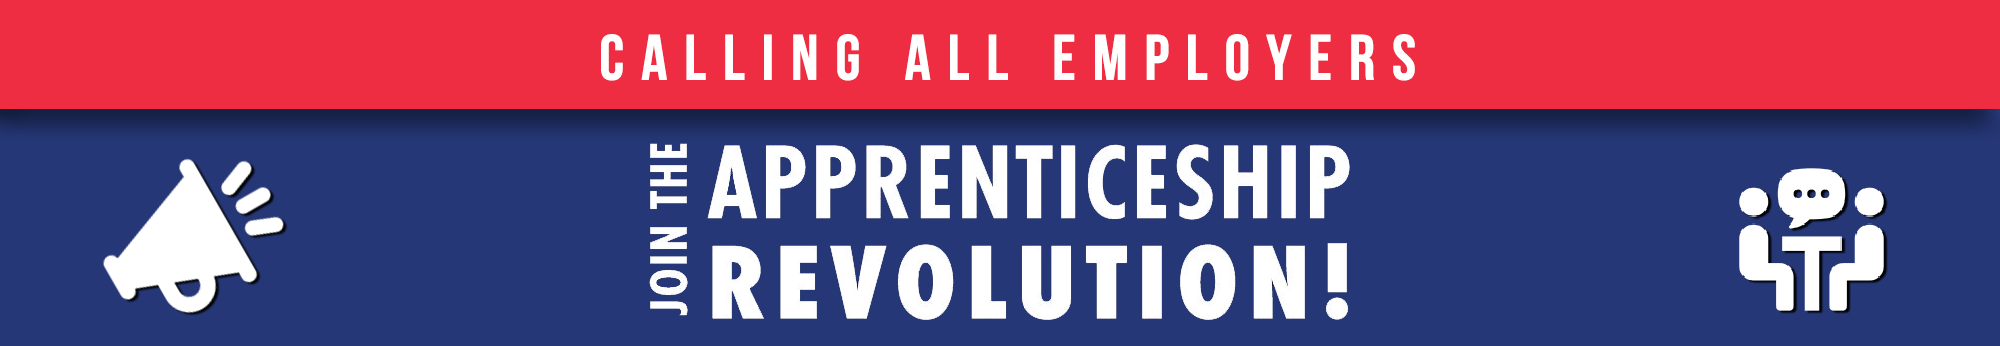 Apprenticeship Revolution Calling all Employers